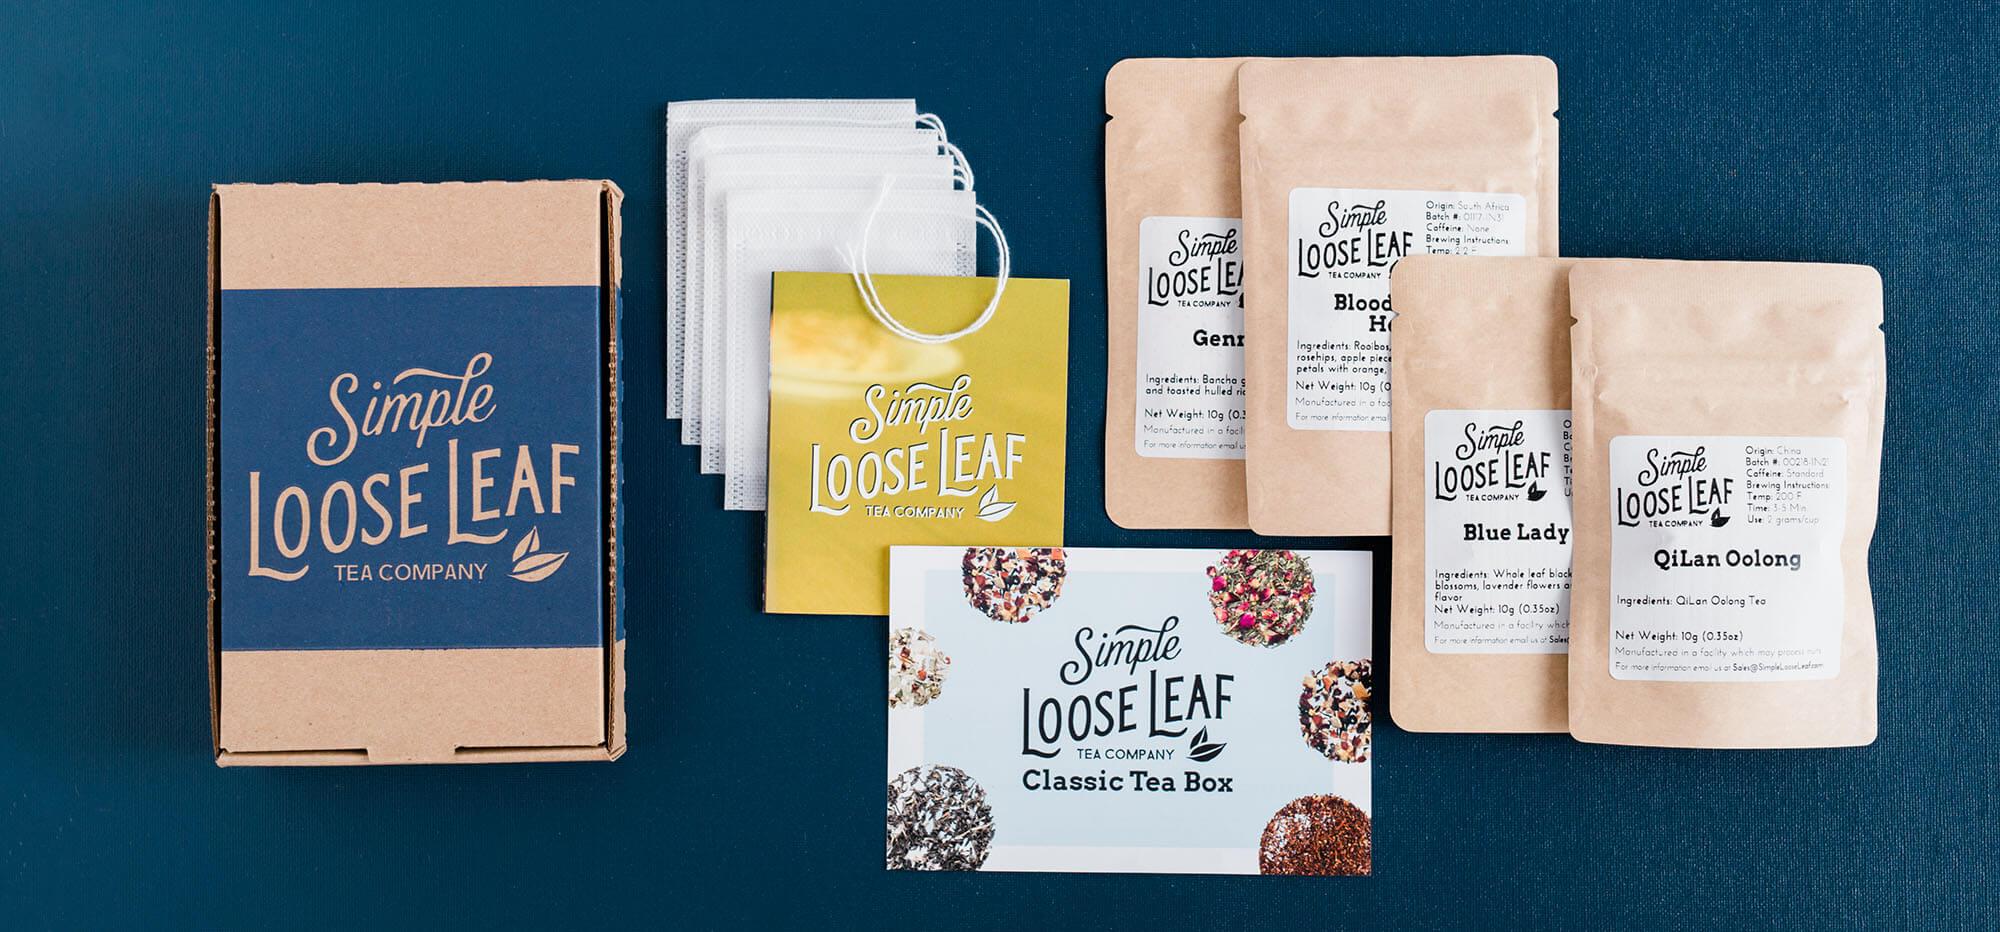 simple loose leaf company packhelp post cardboard box